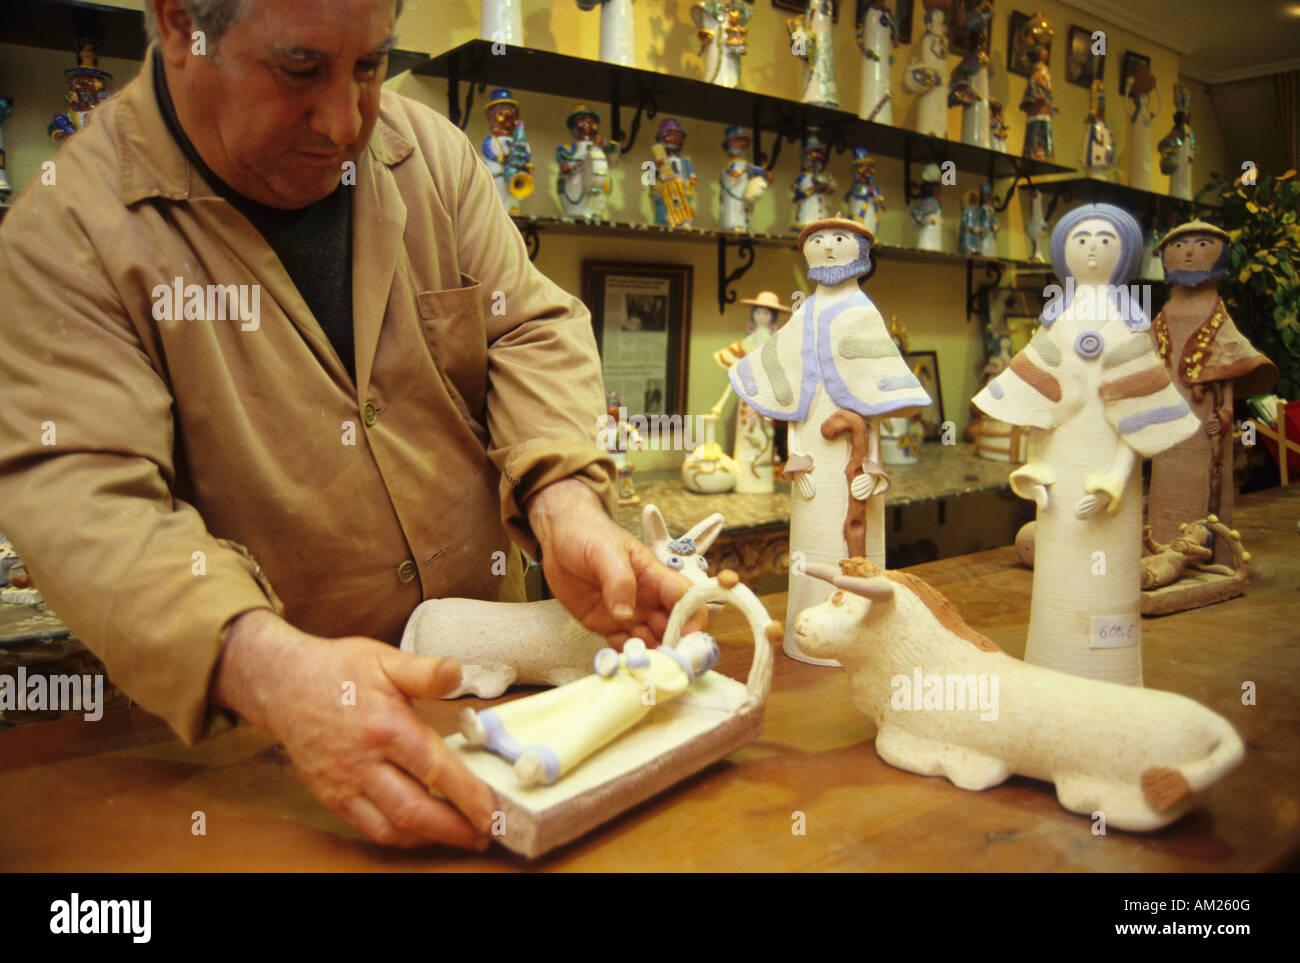 Rafael Ortega National prize of Crafts in his shop workshop MERIDA Badajoz Extremadura Spain - Stock Image